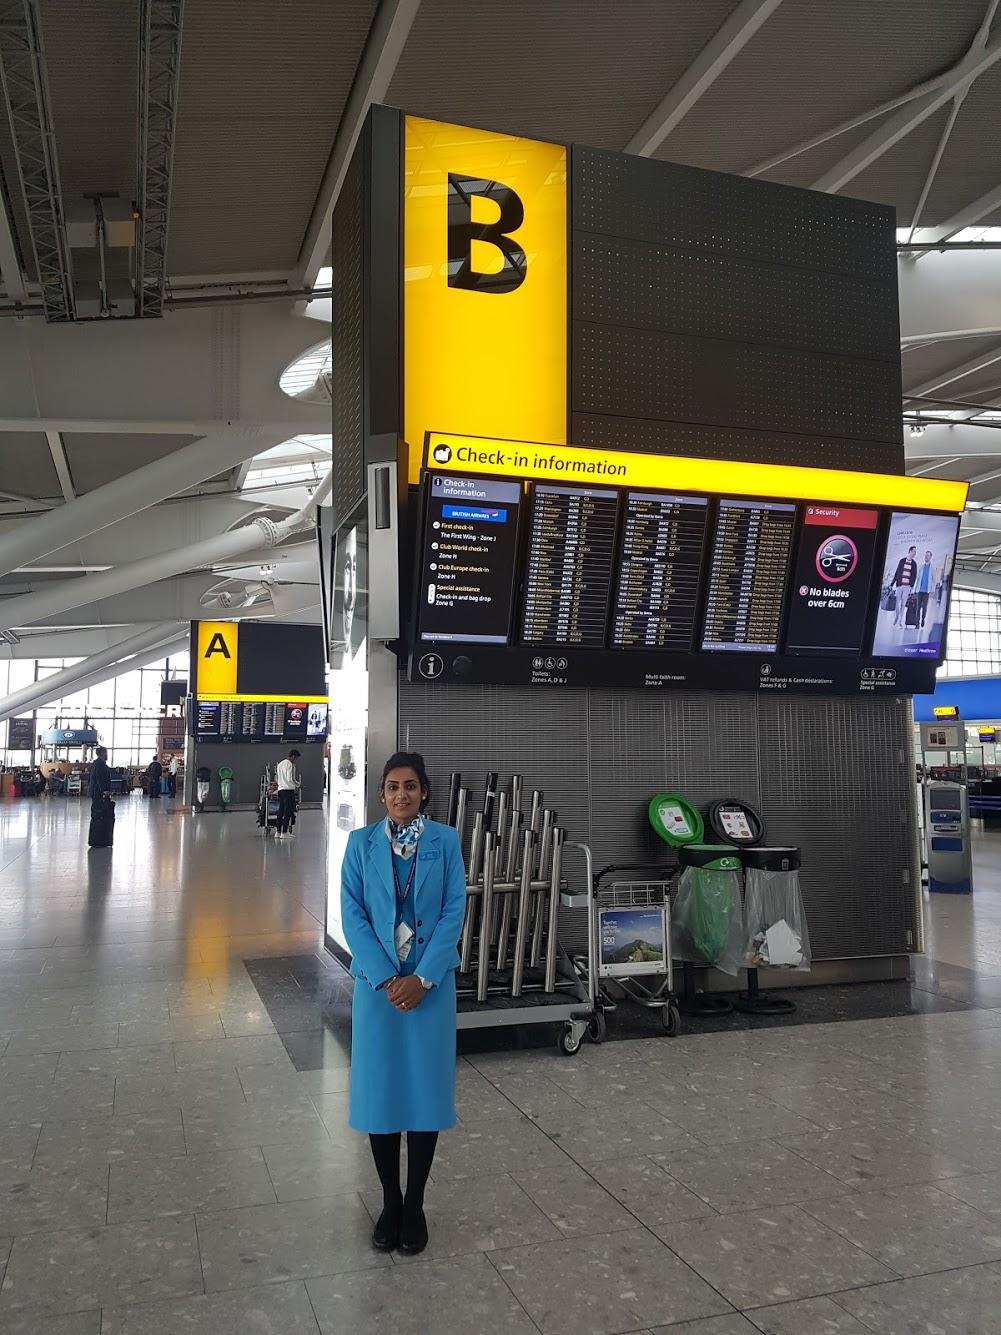 Heathrow Terminal 5 Airportr Help Centre